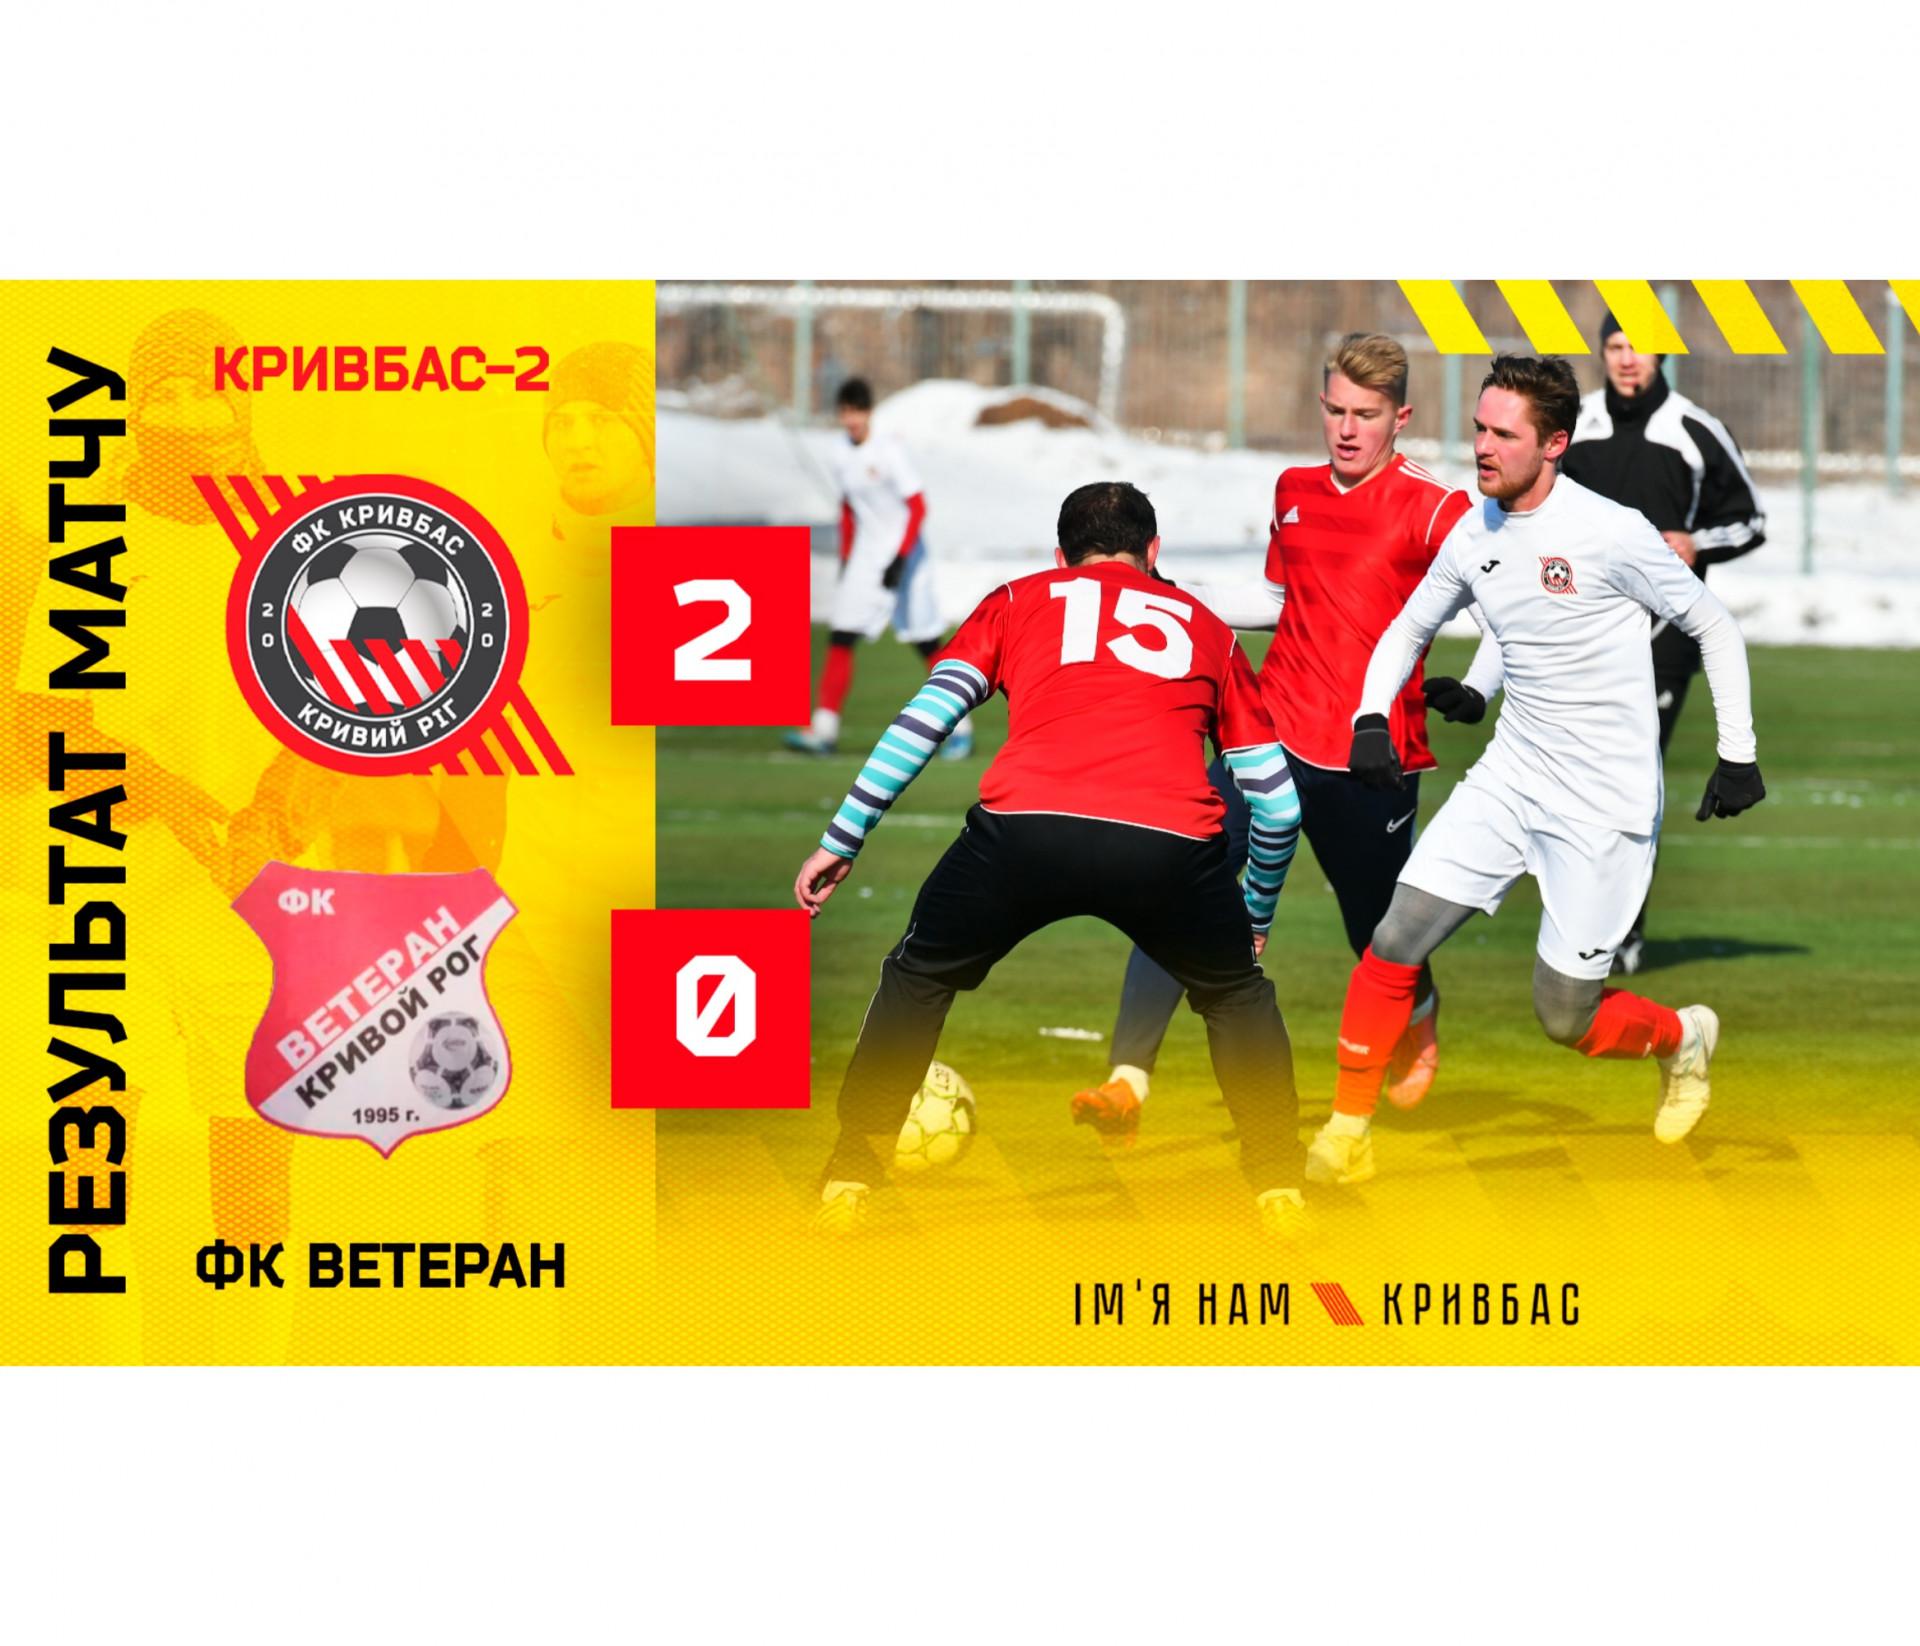 """Кривбас-2"" - ""Ветеран"" 2:0}"